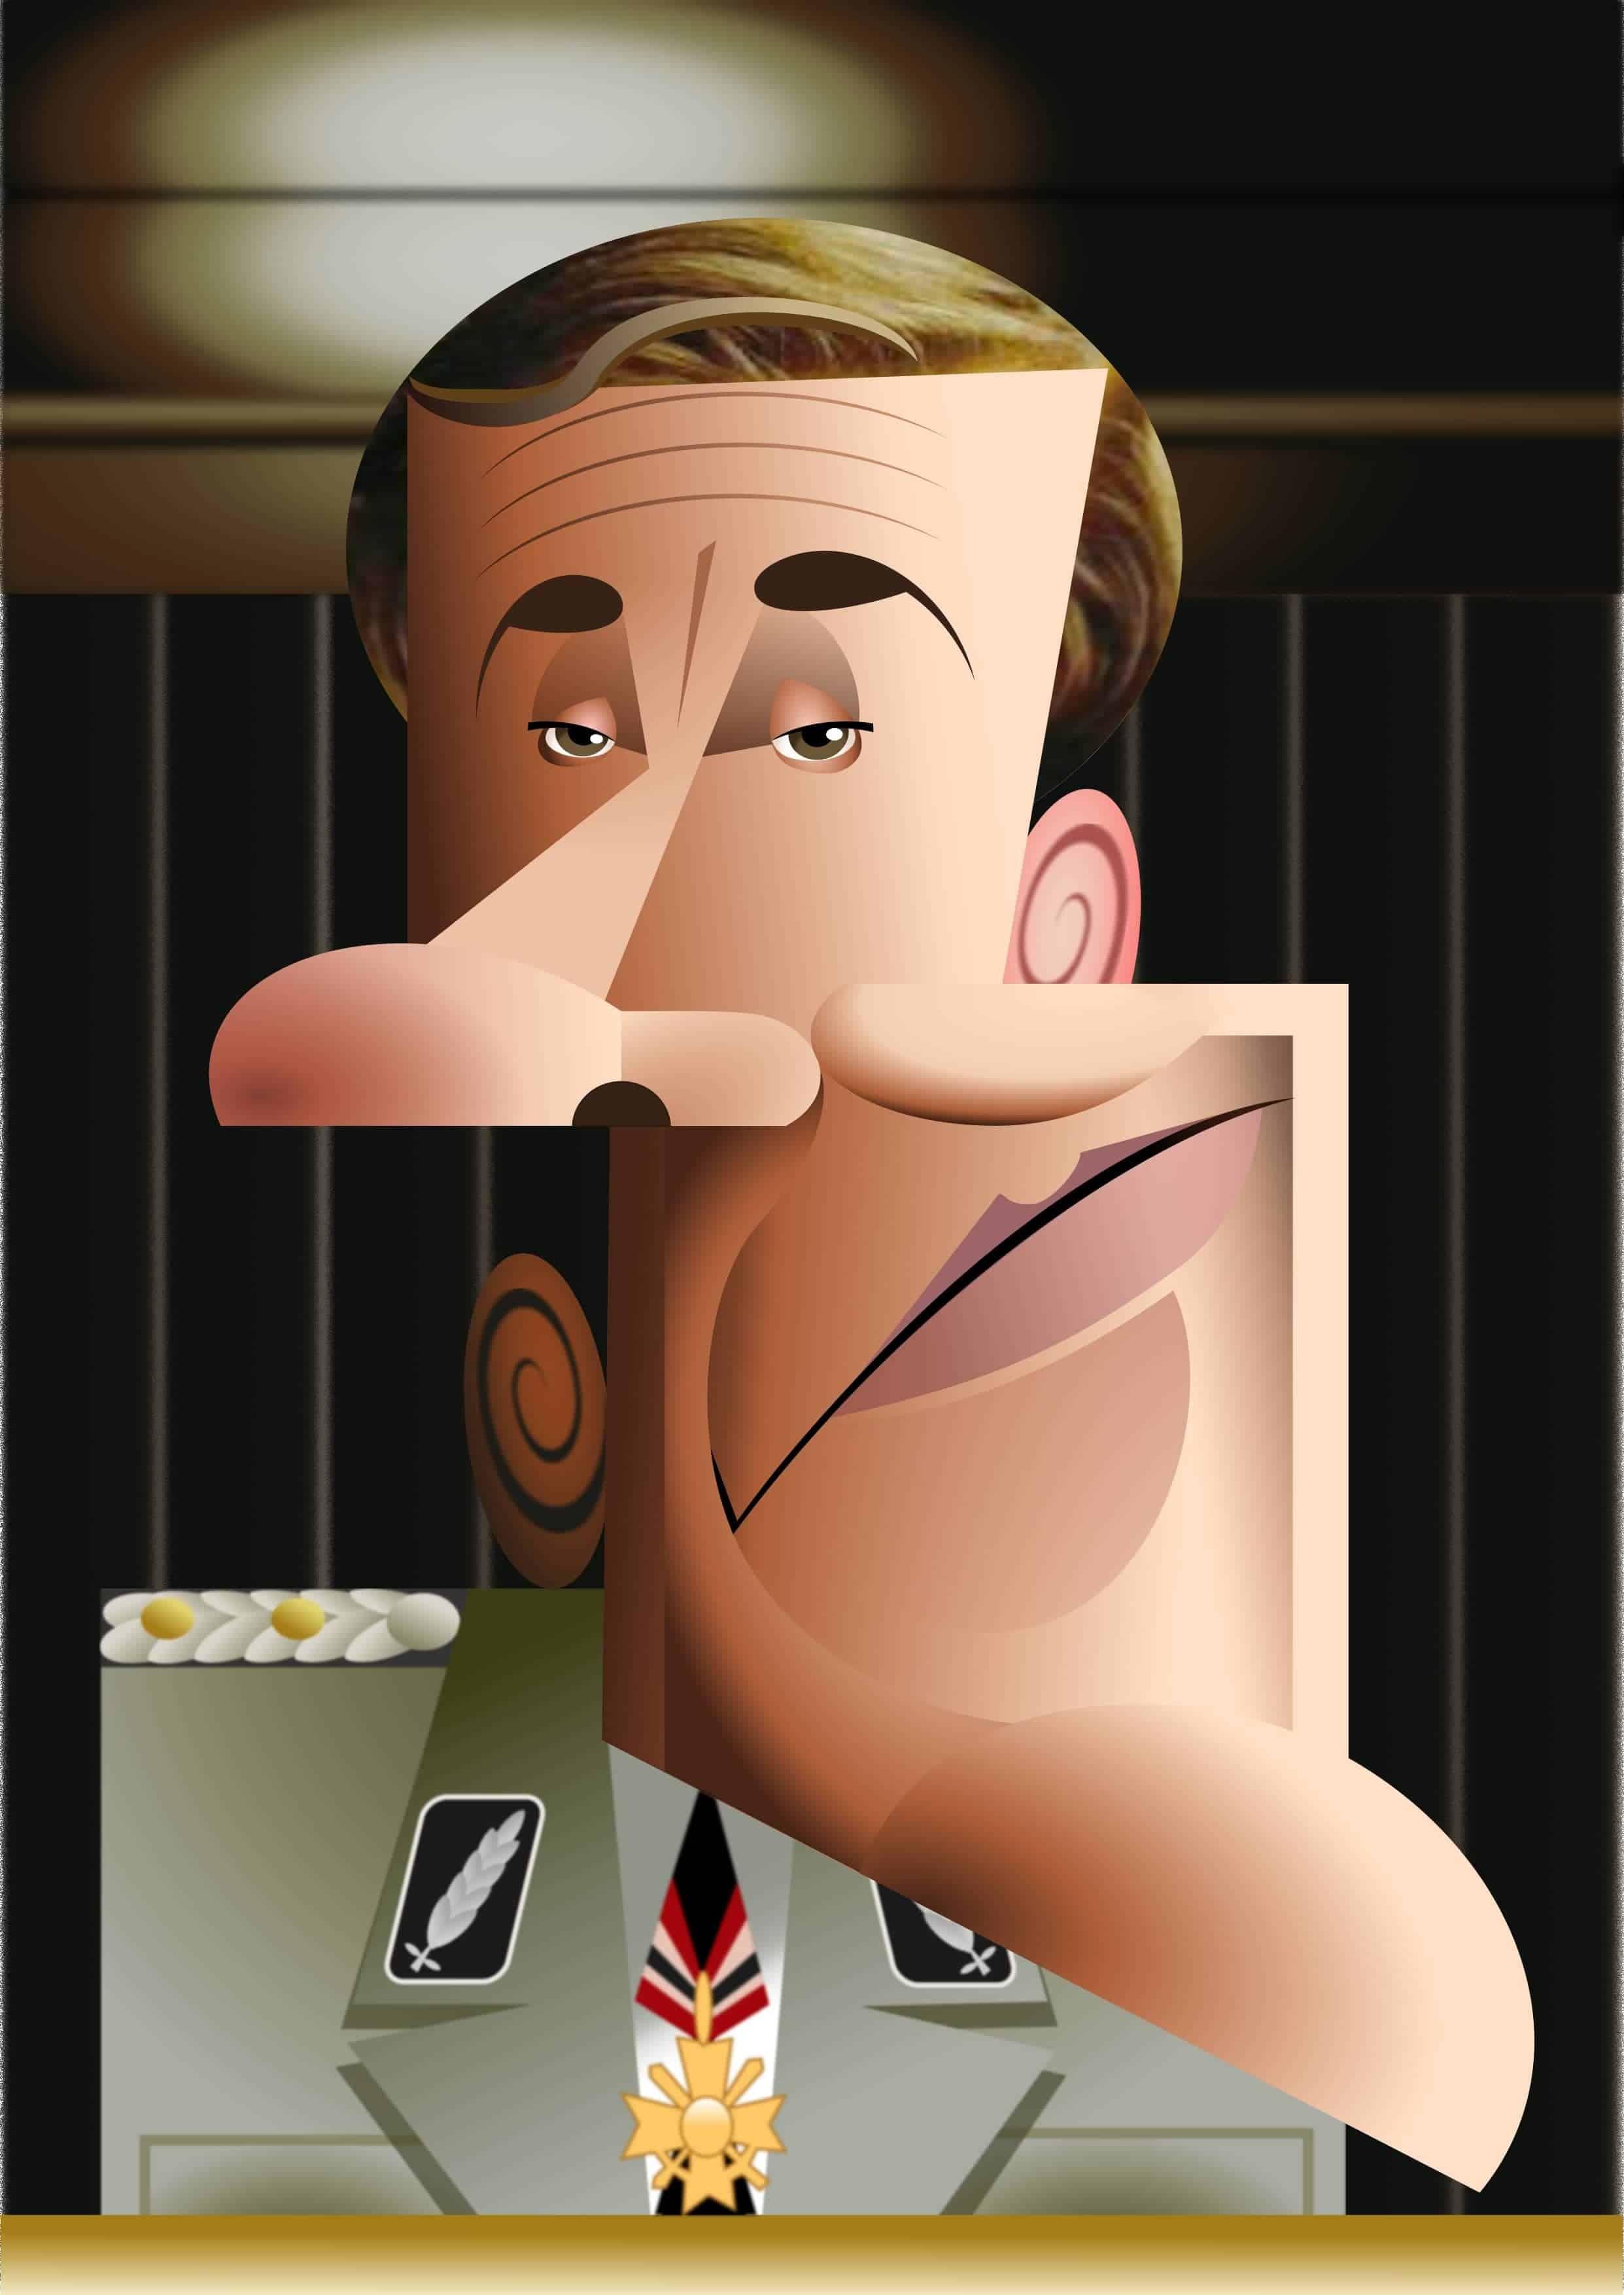 Christoph Waltz caricature